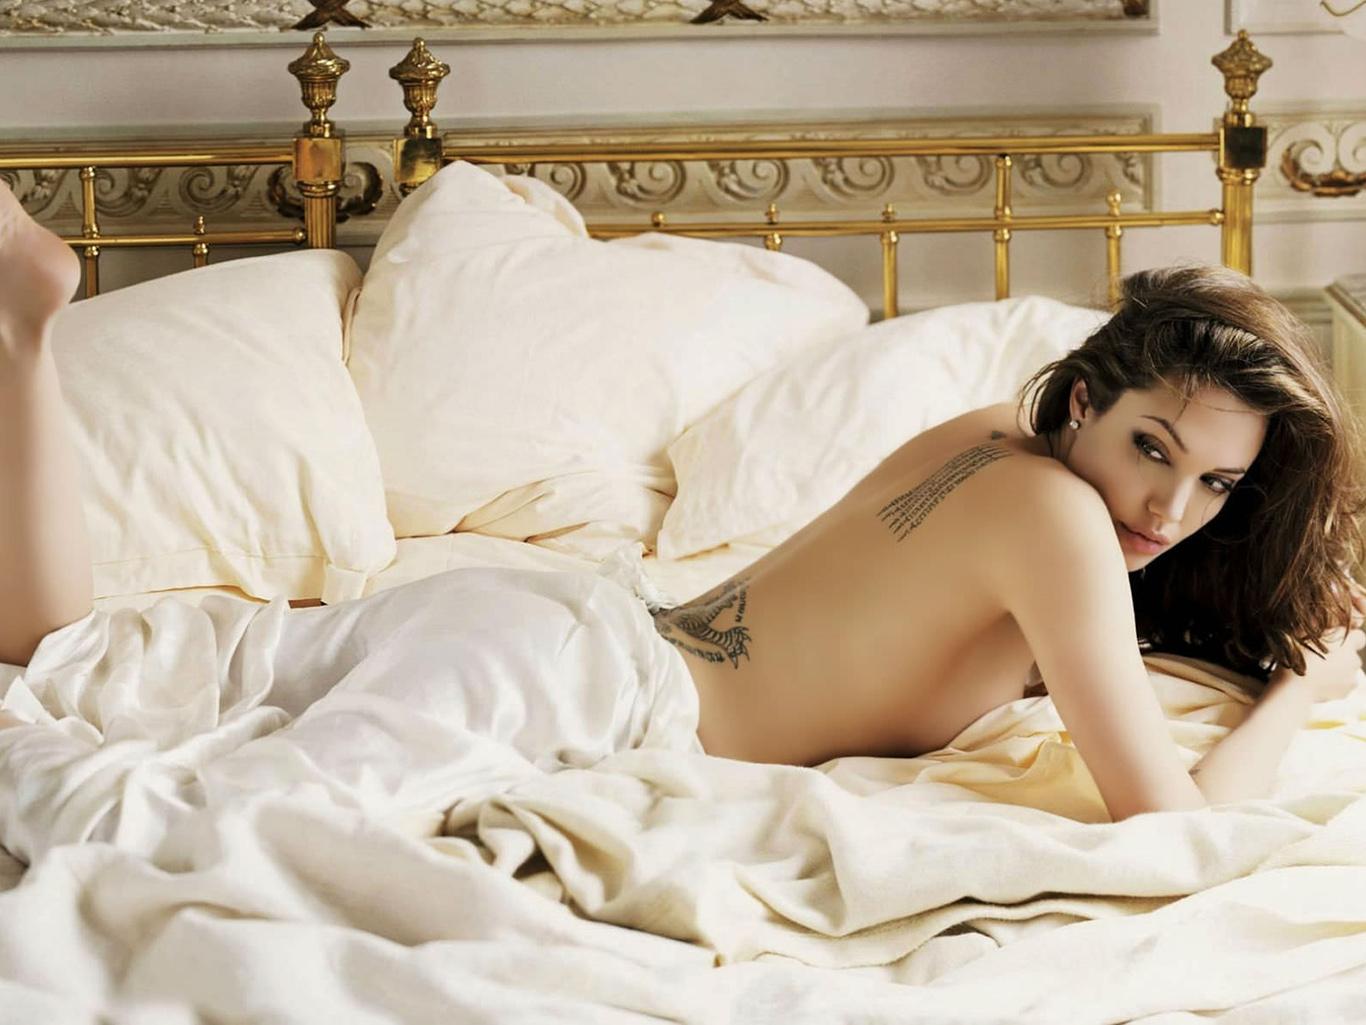 Melissa my wife nude